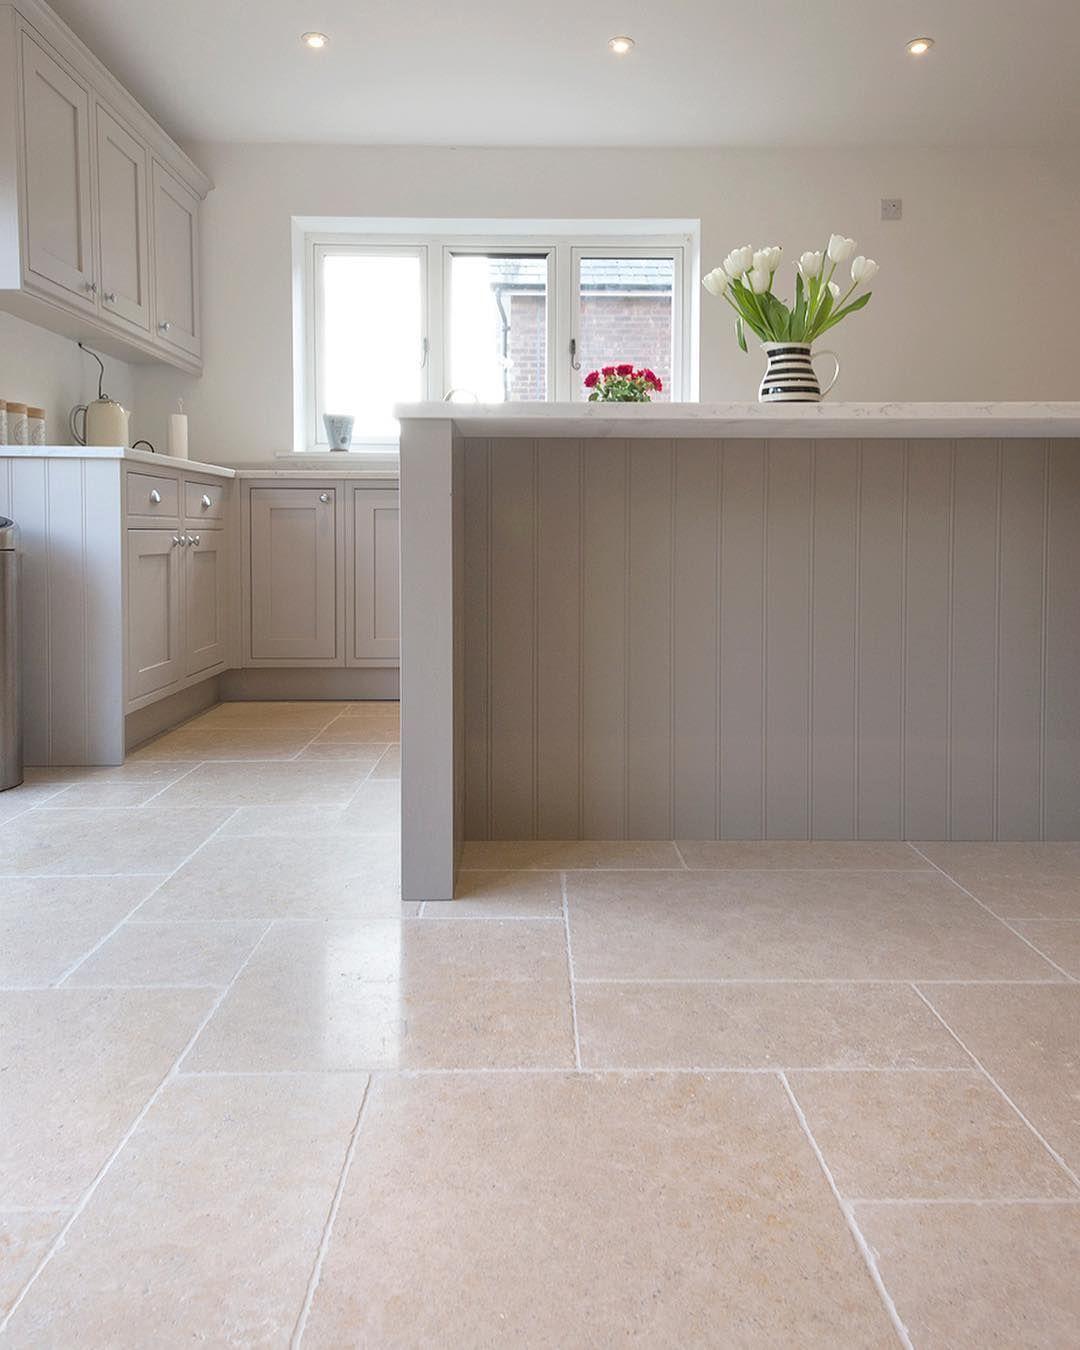 Quorn Stone Mystonefloor On Instagram Our Dijon Tumbled Limestone Tiles In A Large Pattern We Really Lo Kitchen Floor Tile House Flooring Kitchen Flooring